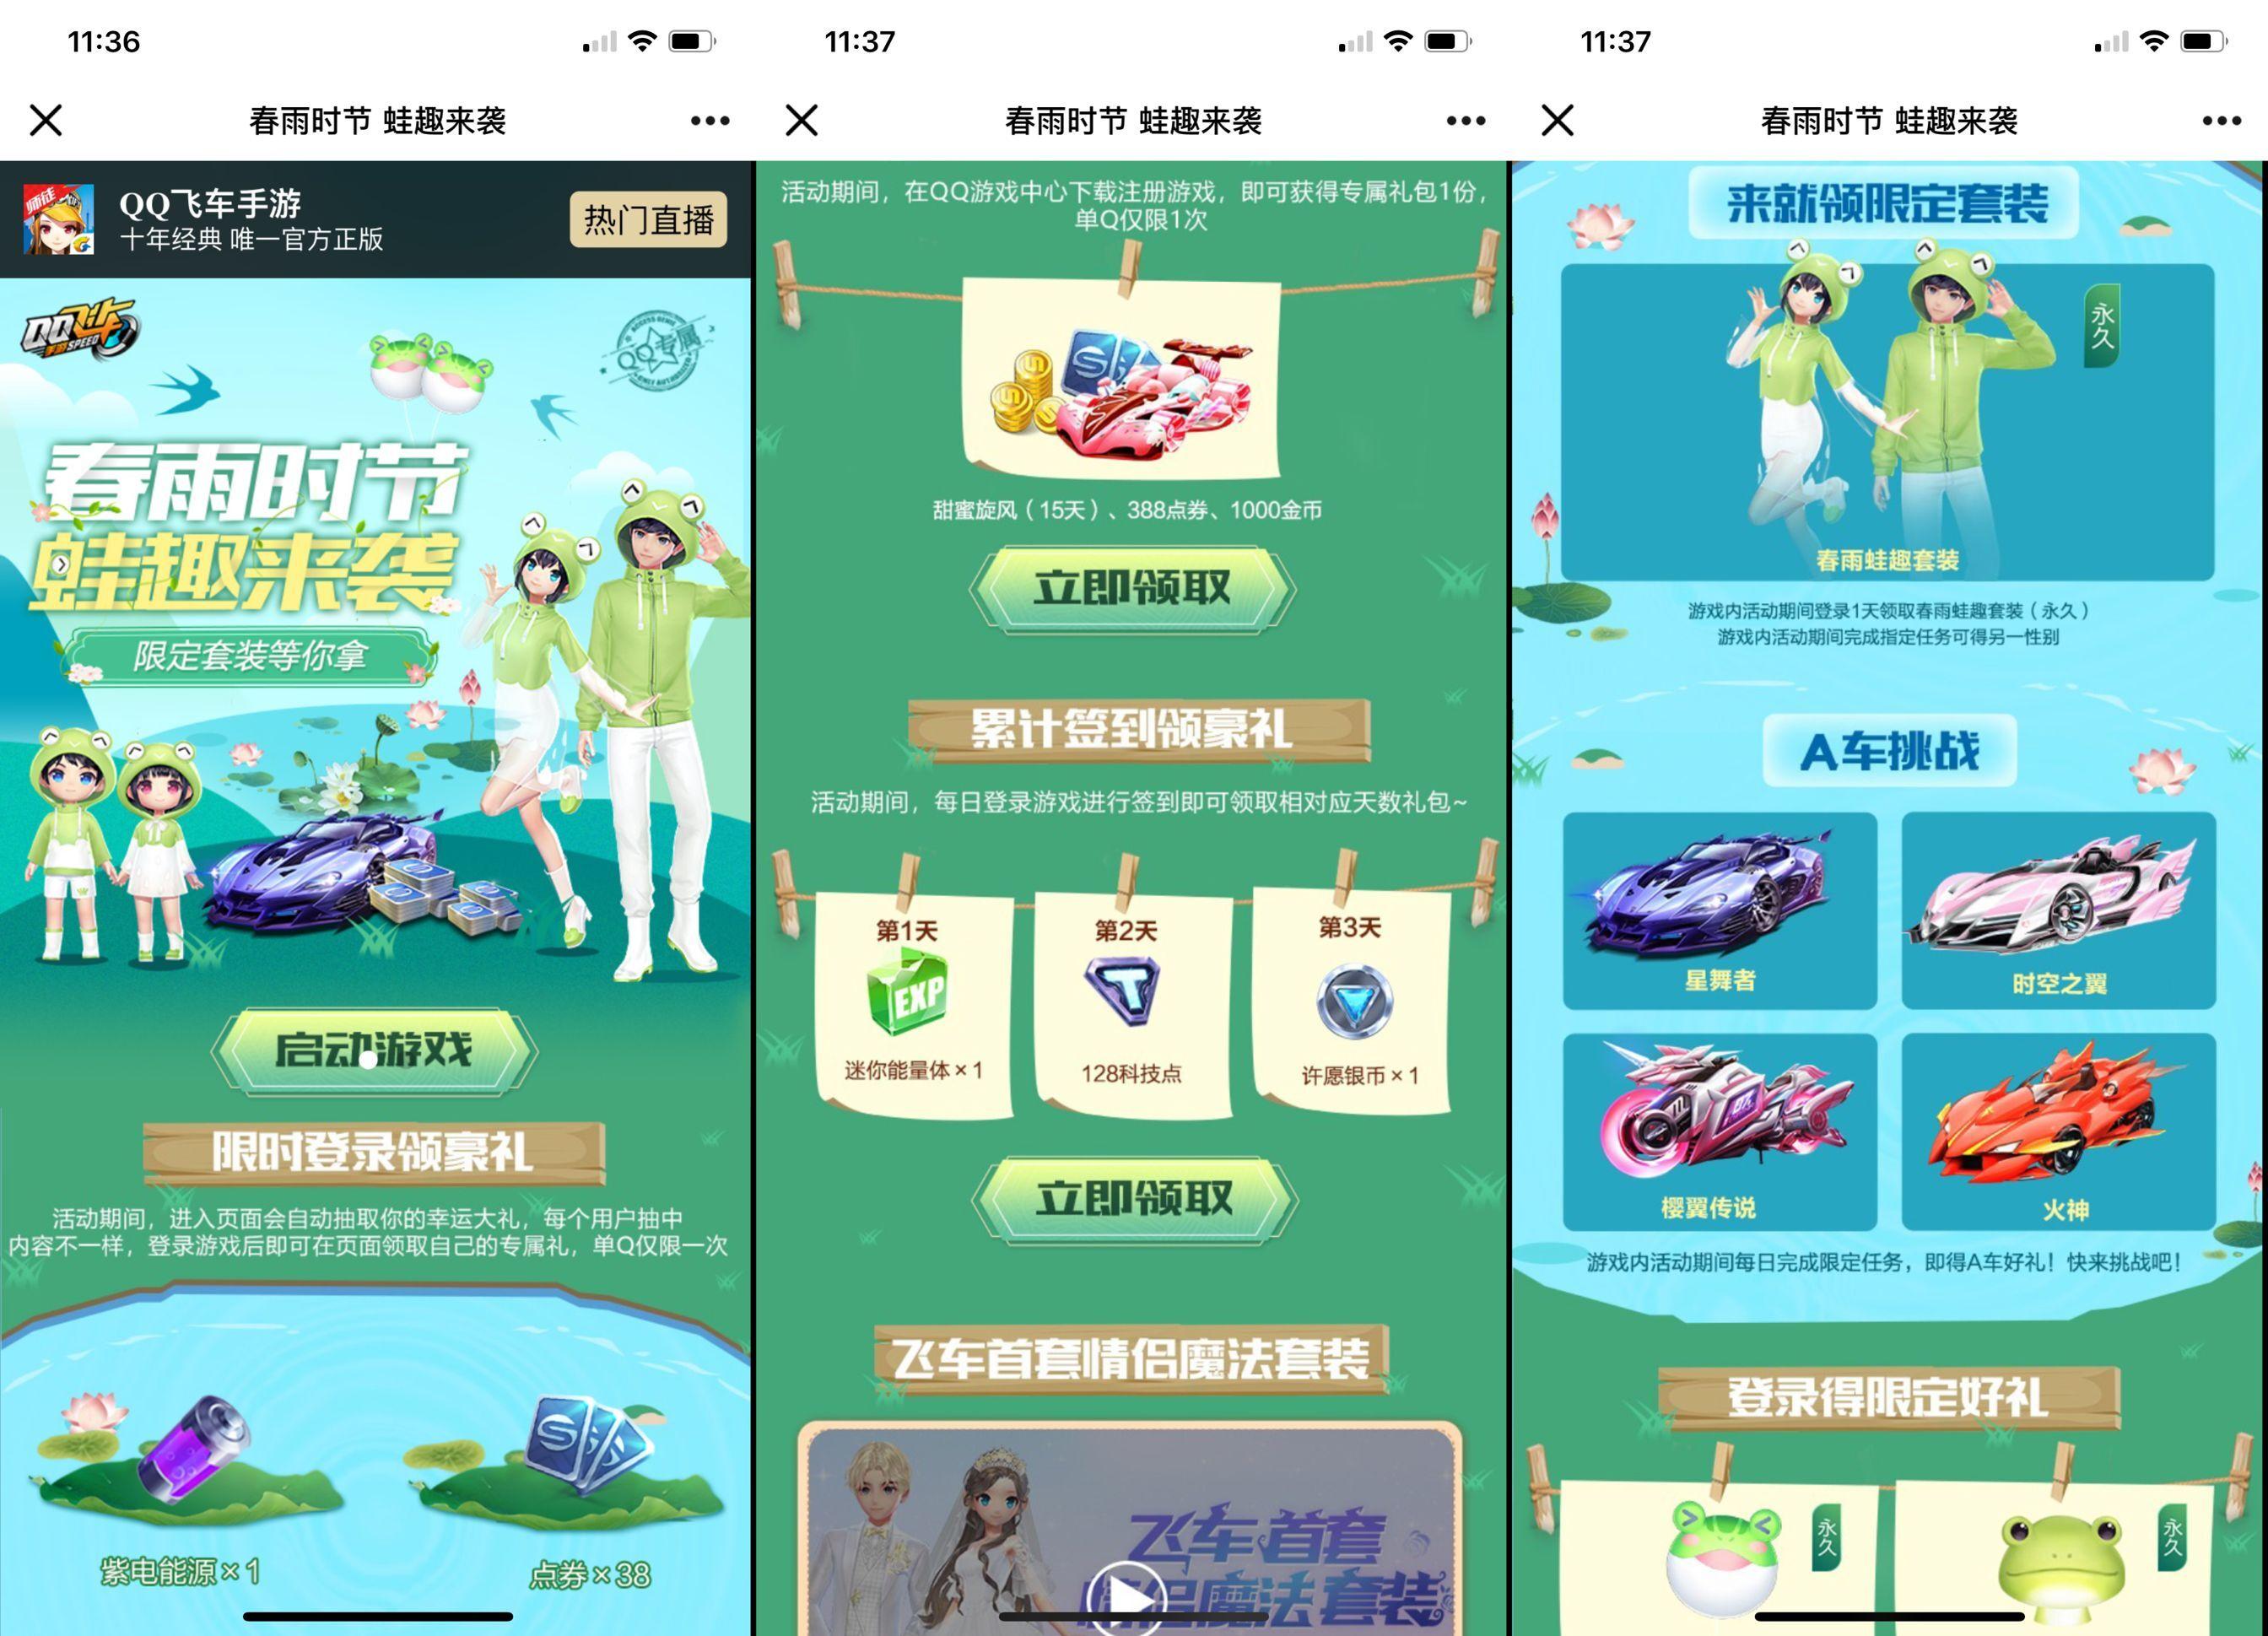 QQ飞车登录游戏领永久套装